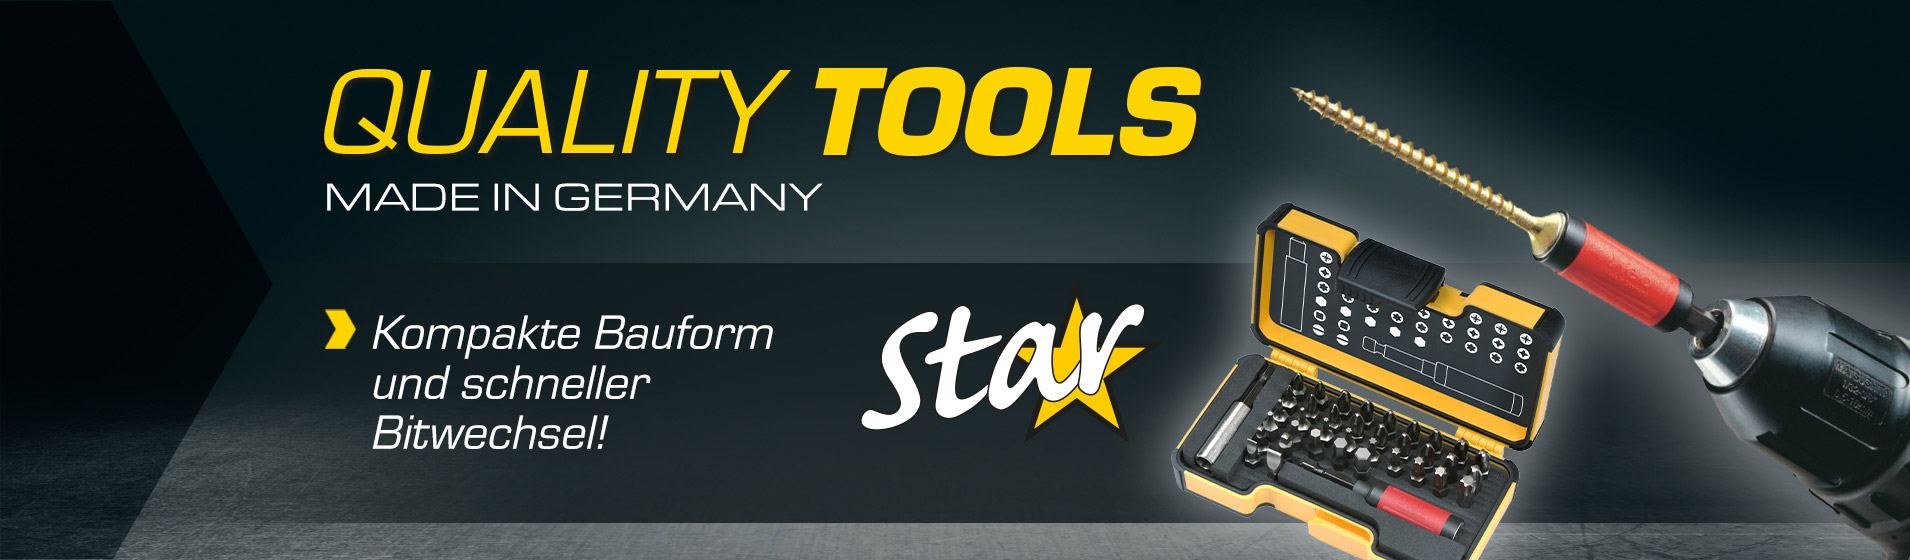 [Translate to HU:] FELO STAR - Kompakte Bauform und schneller Bitwechsel